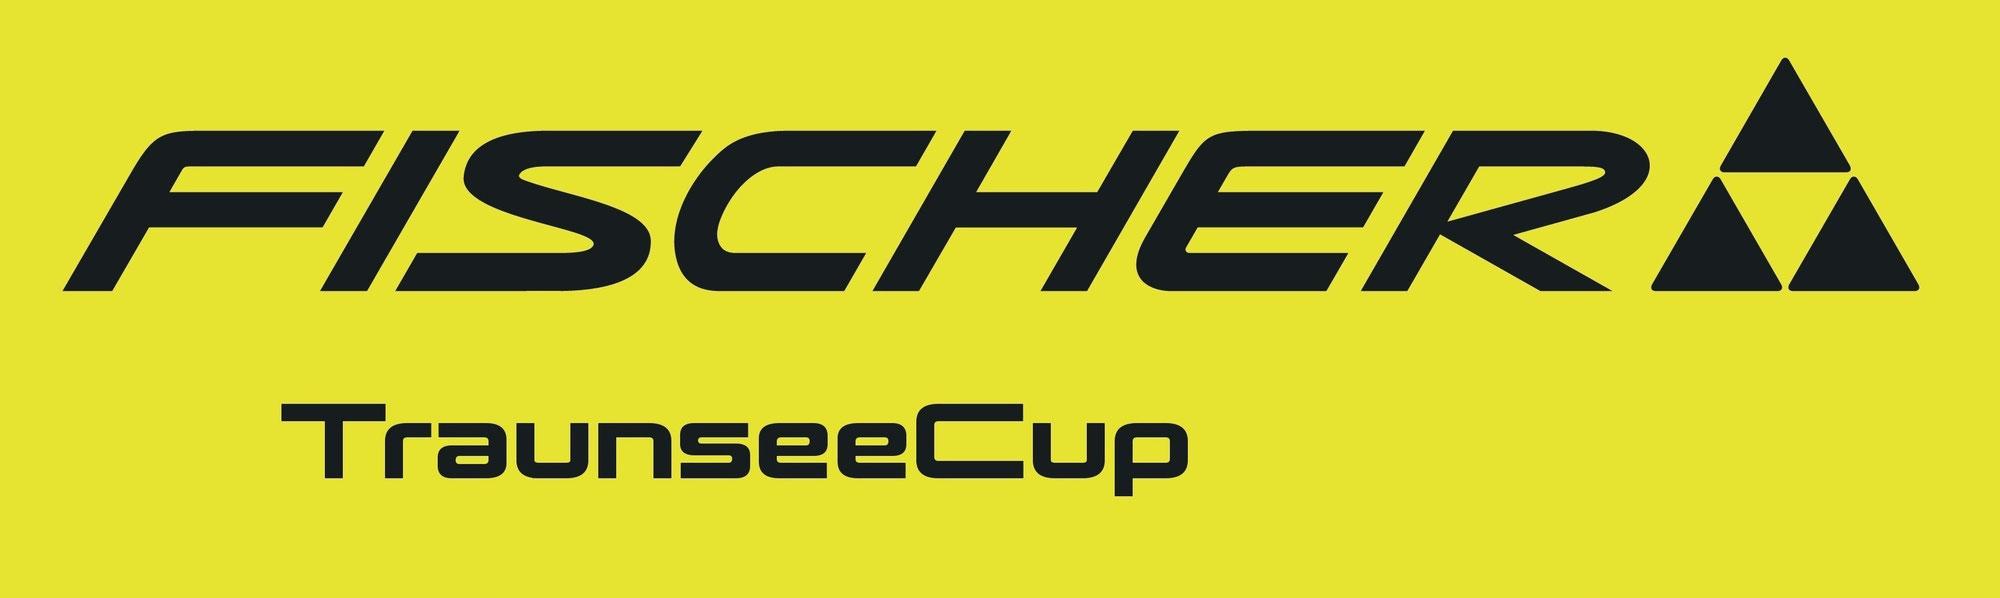 Traunsee-Cup 2021 abgesagt